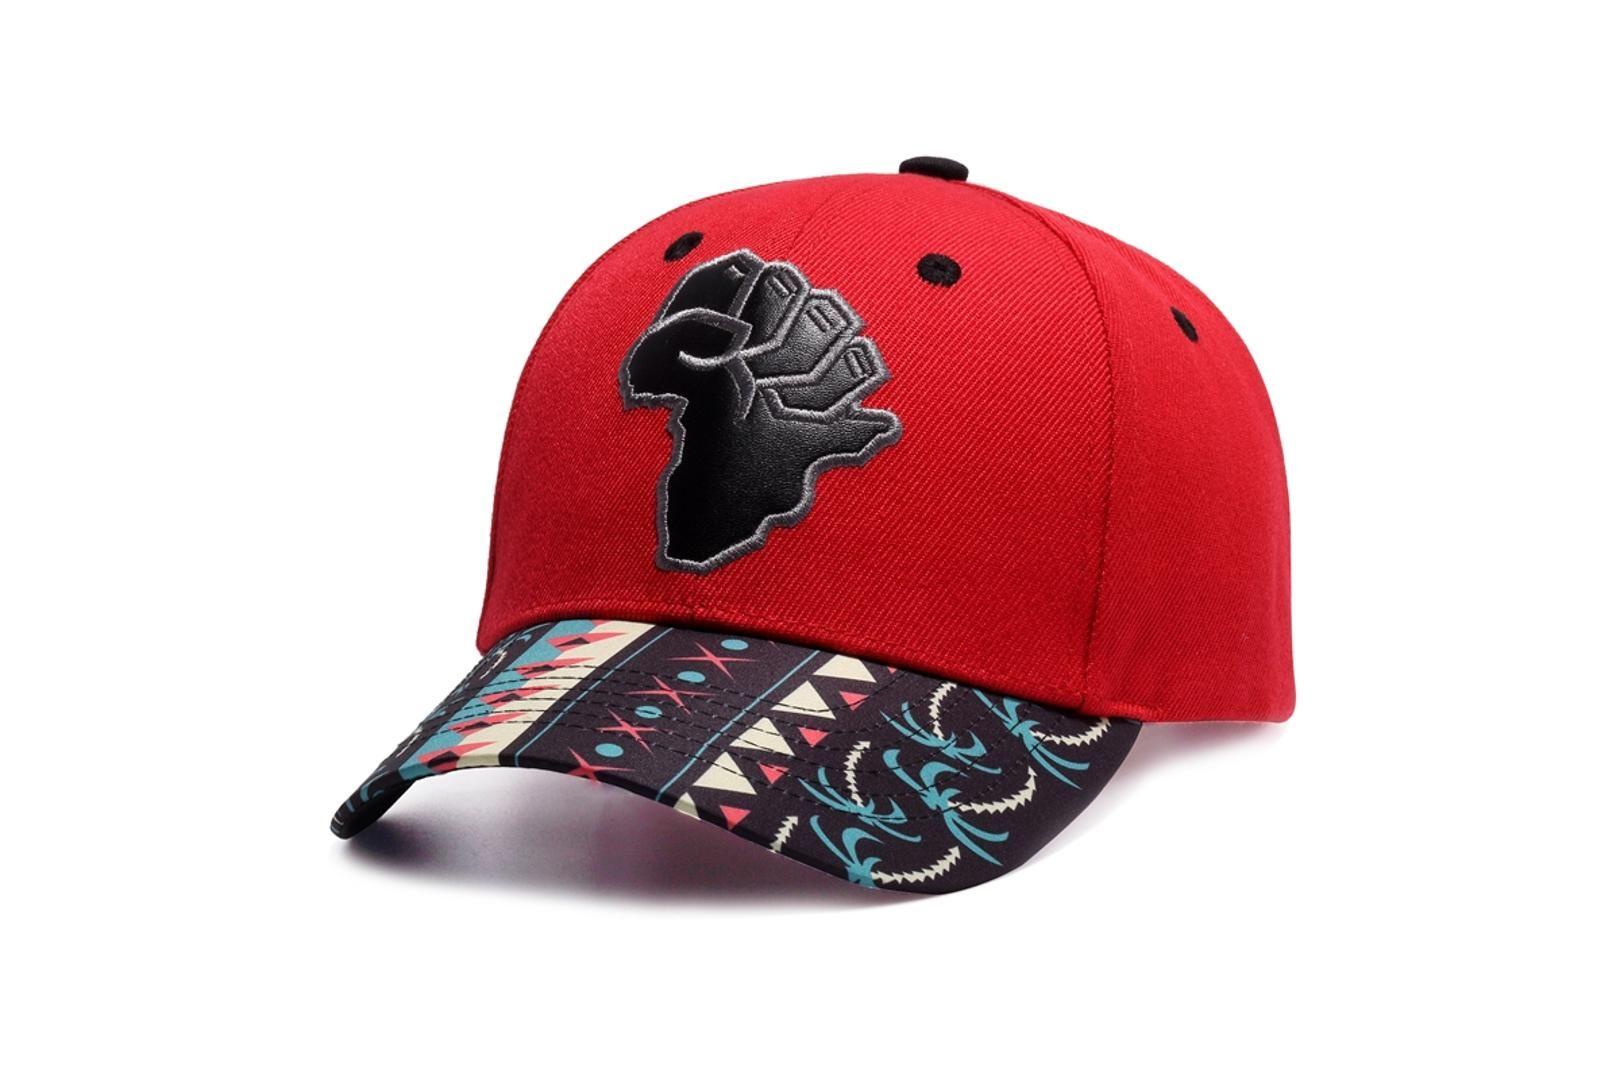 Navy Seals Baseball Caps CaUS Army Visor Caps Mens Commando Gorras Urban  Tactical Snapback Hats Army Sniper Camouflage Womens Baseball Hats Cheap  Snapback ... c0e6e9b5929